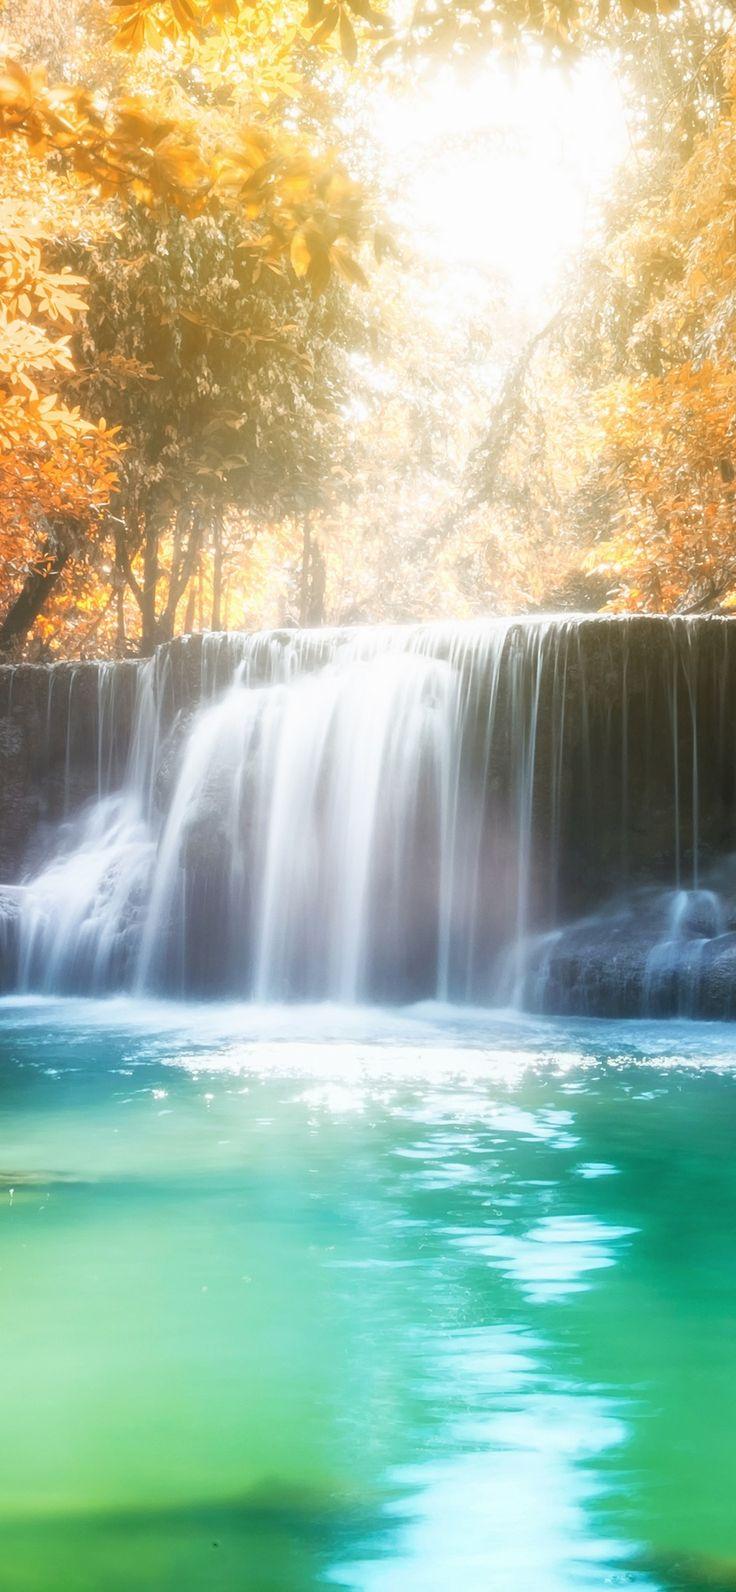 True Nature Green Waterfall Wallpaper iPhone Xr 7